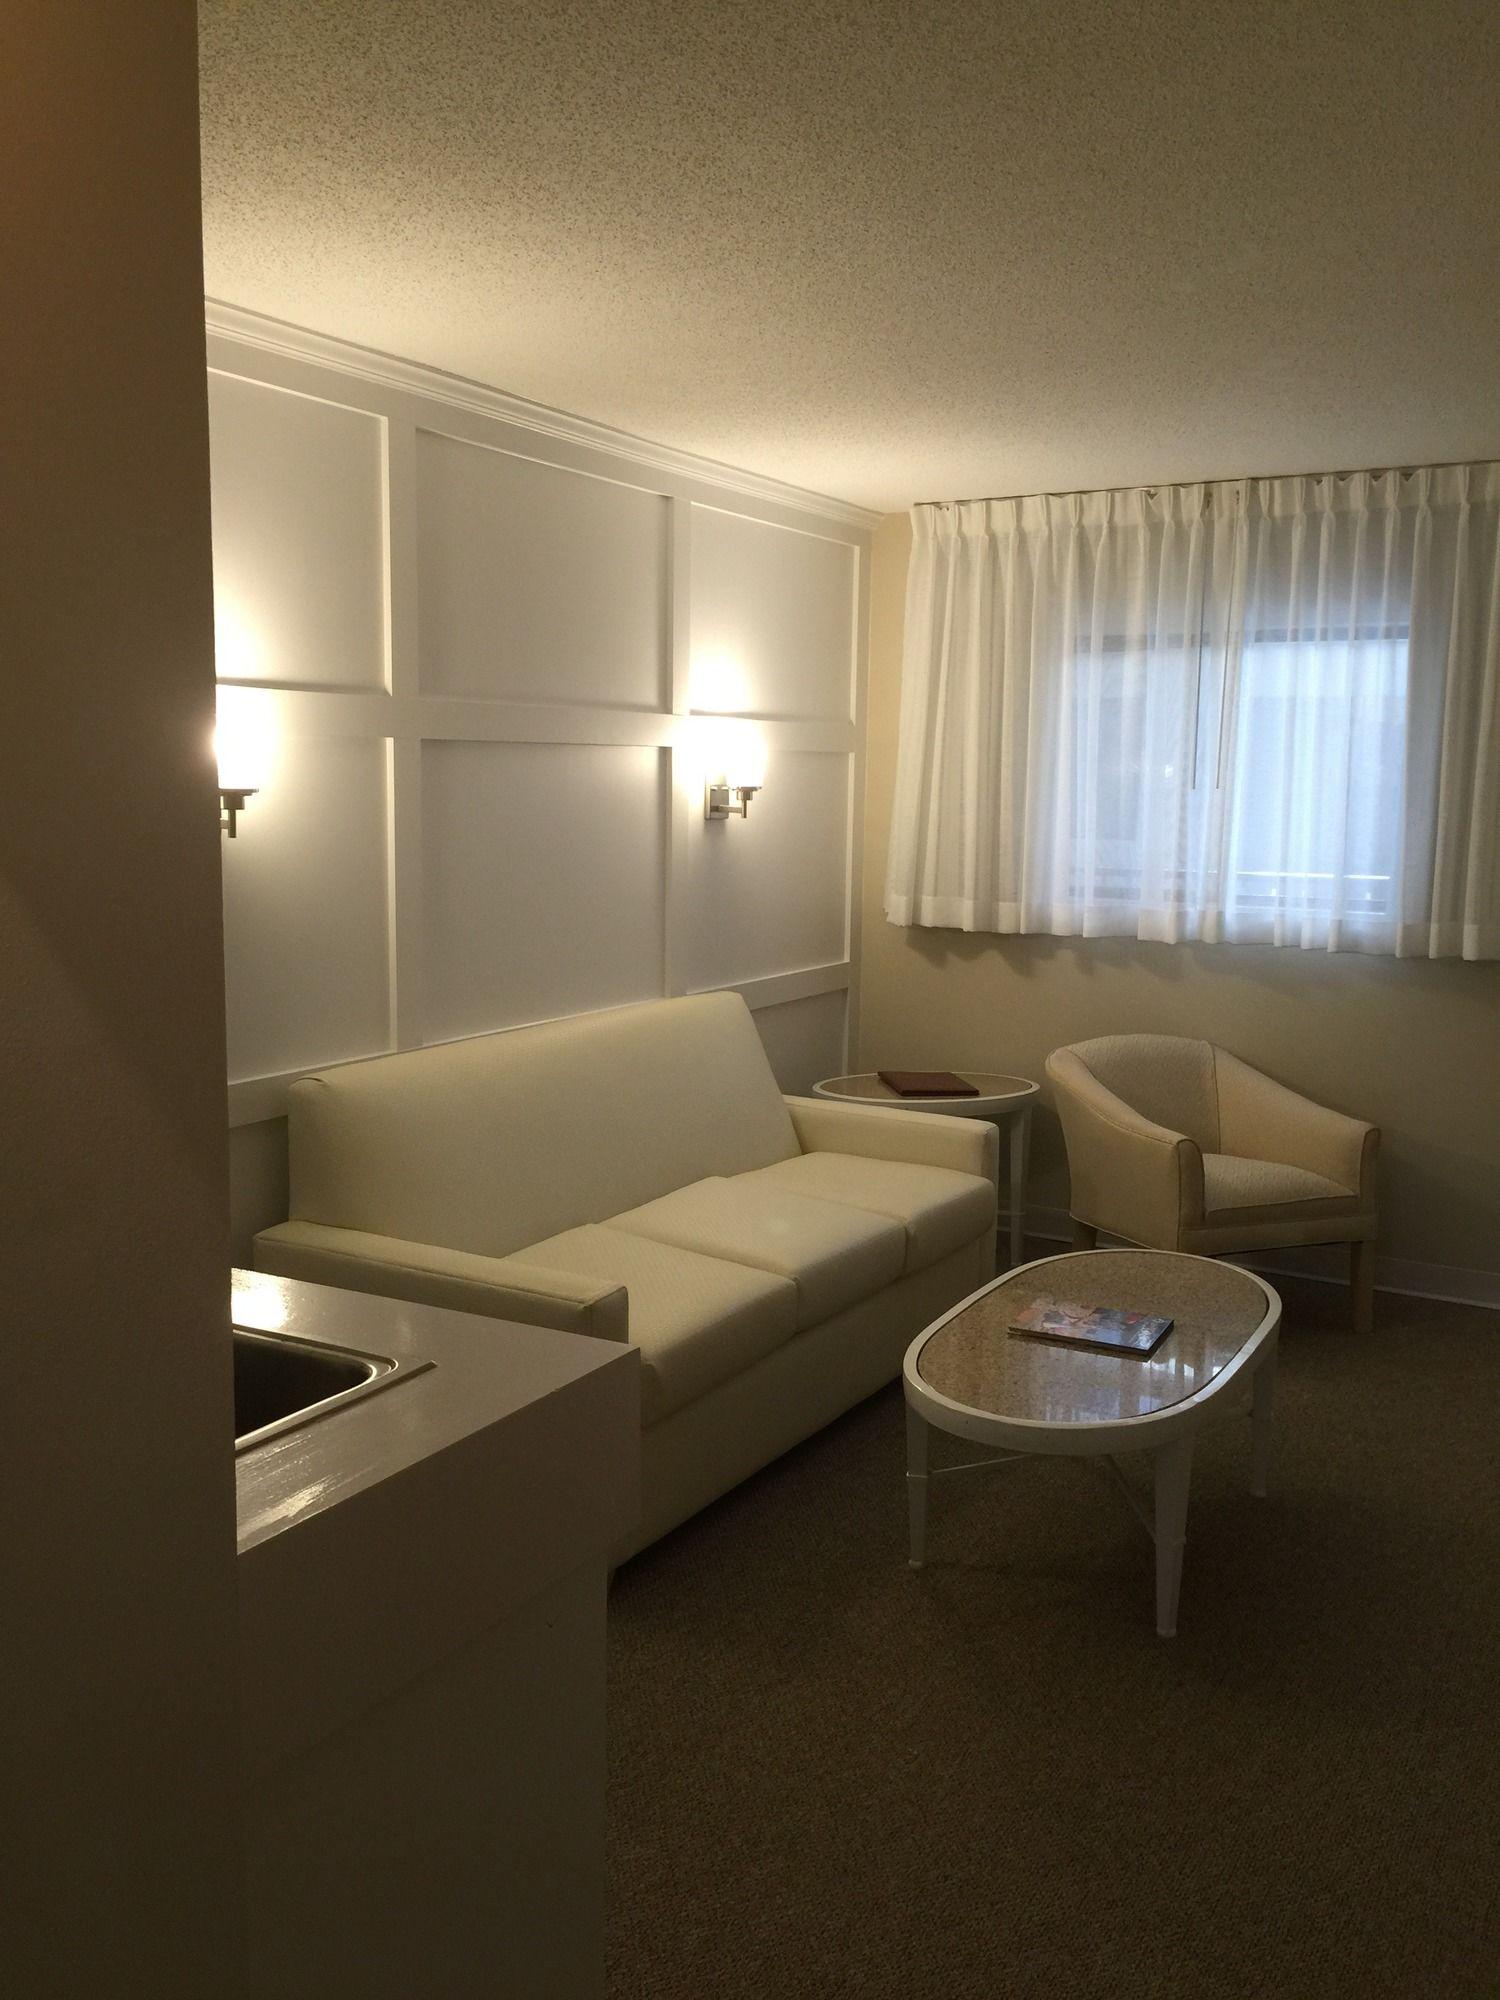 Brighton Suites Hotel in Rehoboth Beach, DE